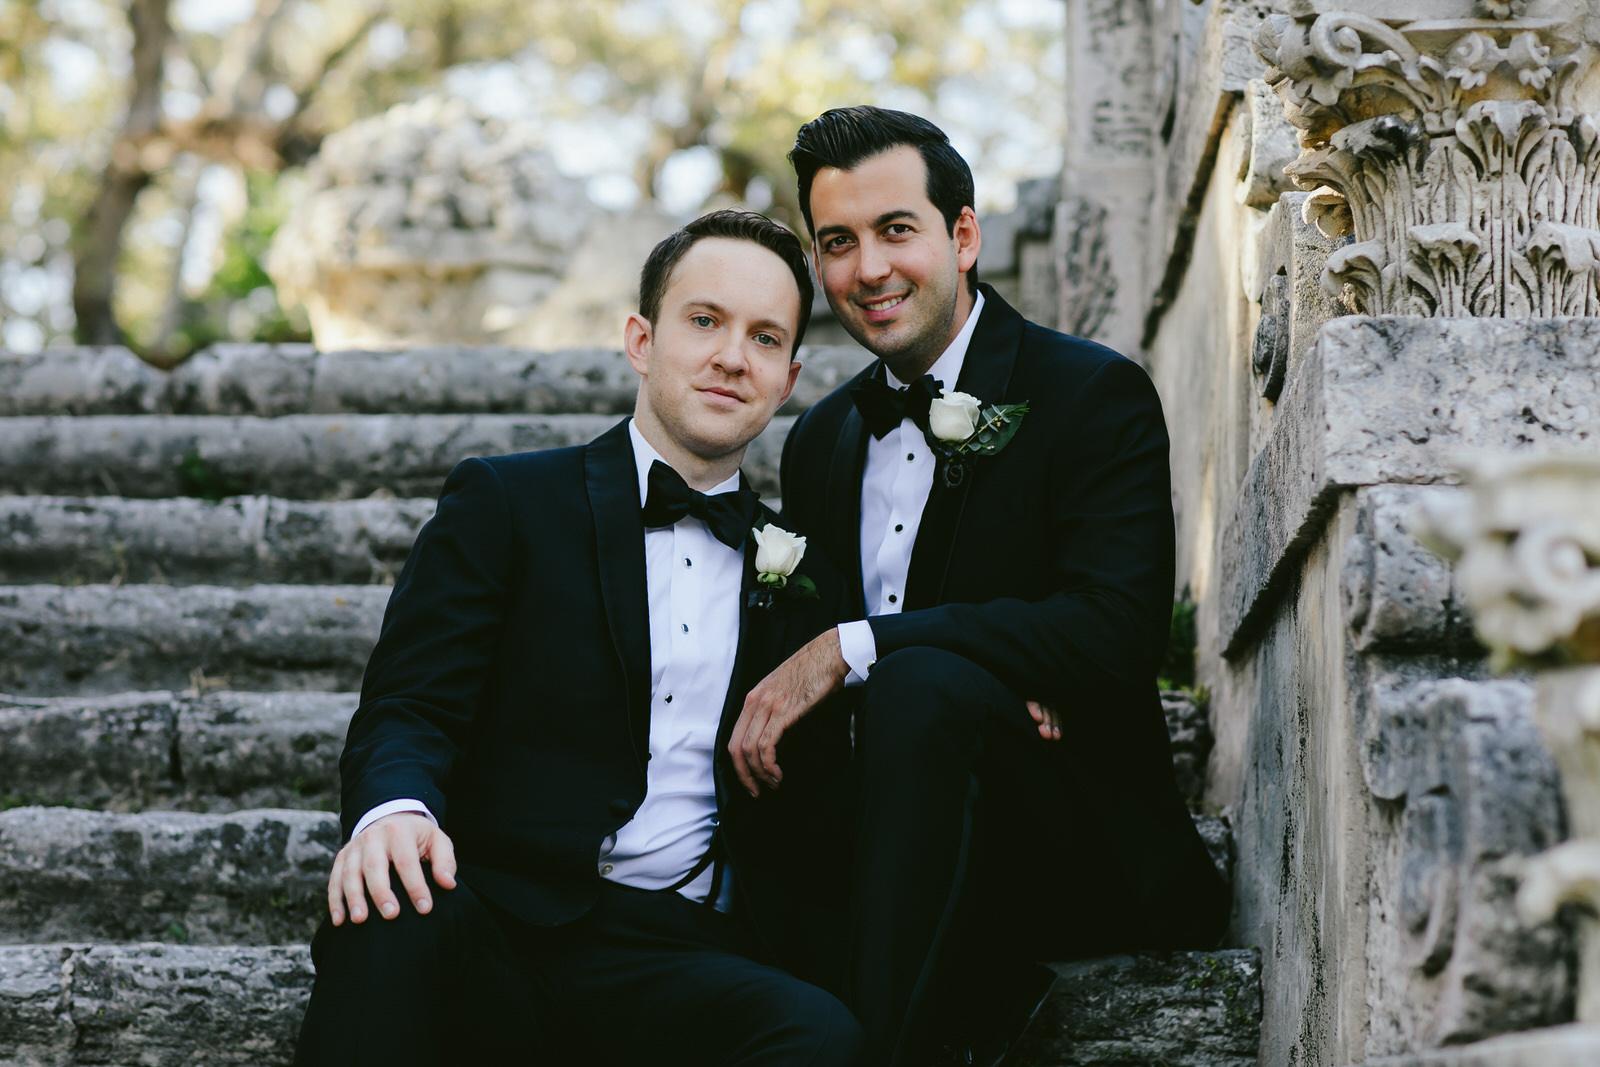 vizcaya_elopement_intimate_wedding_portraits_tiny_house_photo-59.jpg